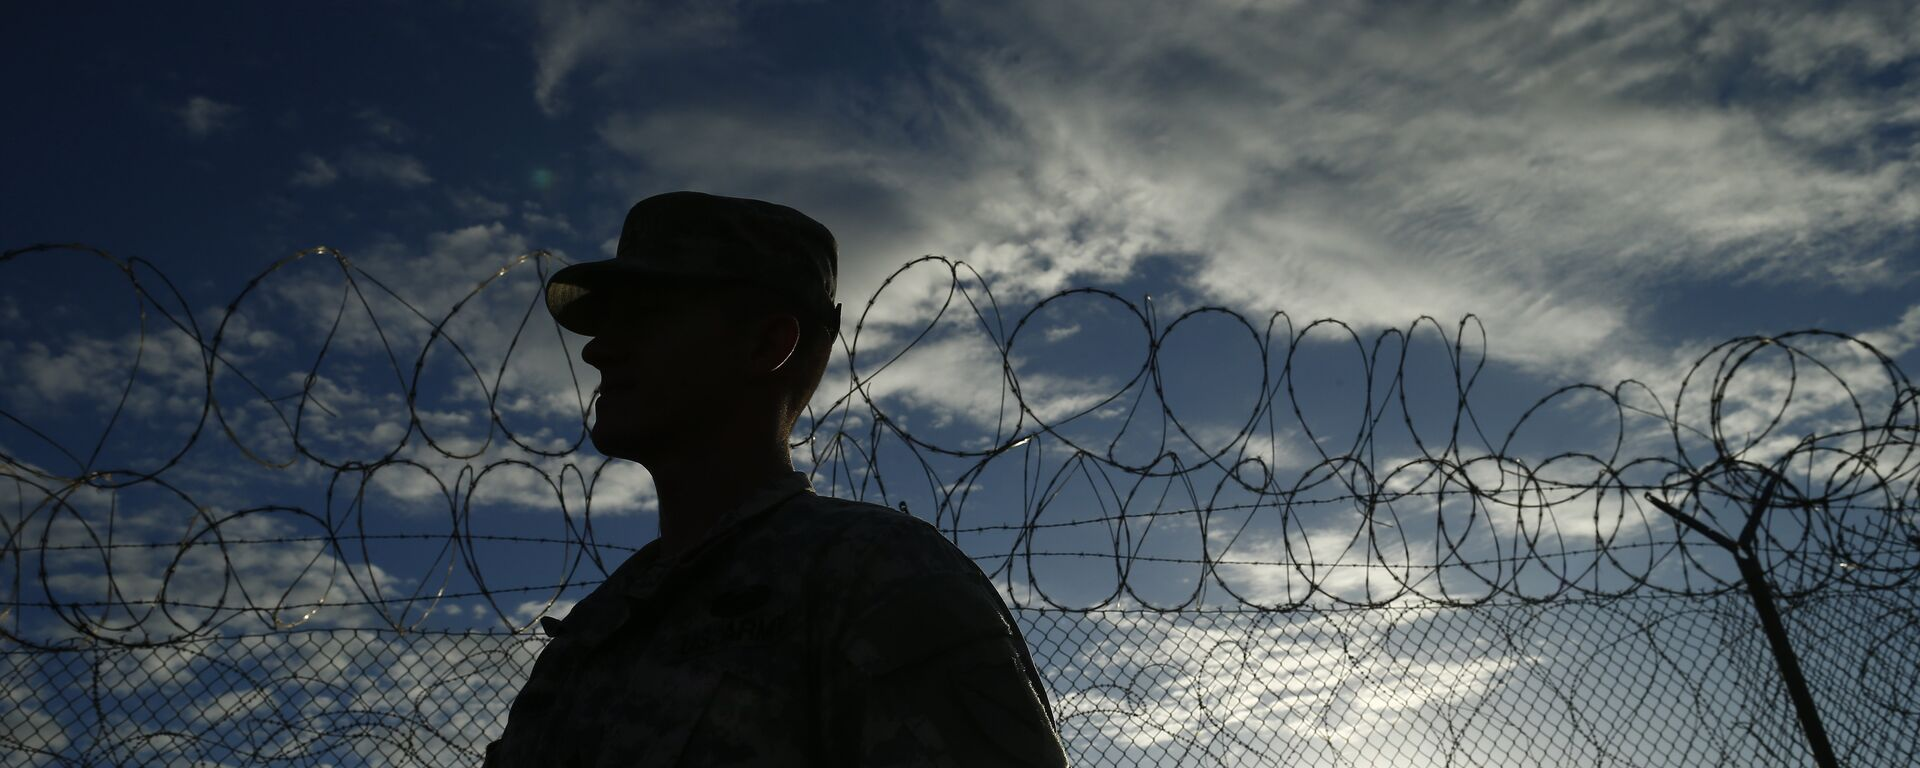 Soldado estadounidense en Guantánamo - Sputnik Mundo, 1920, 28.11.2020